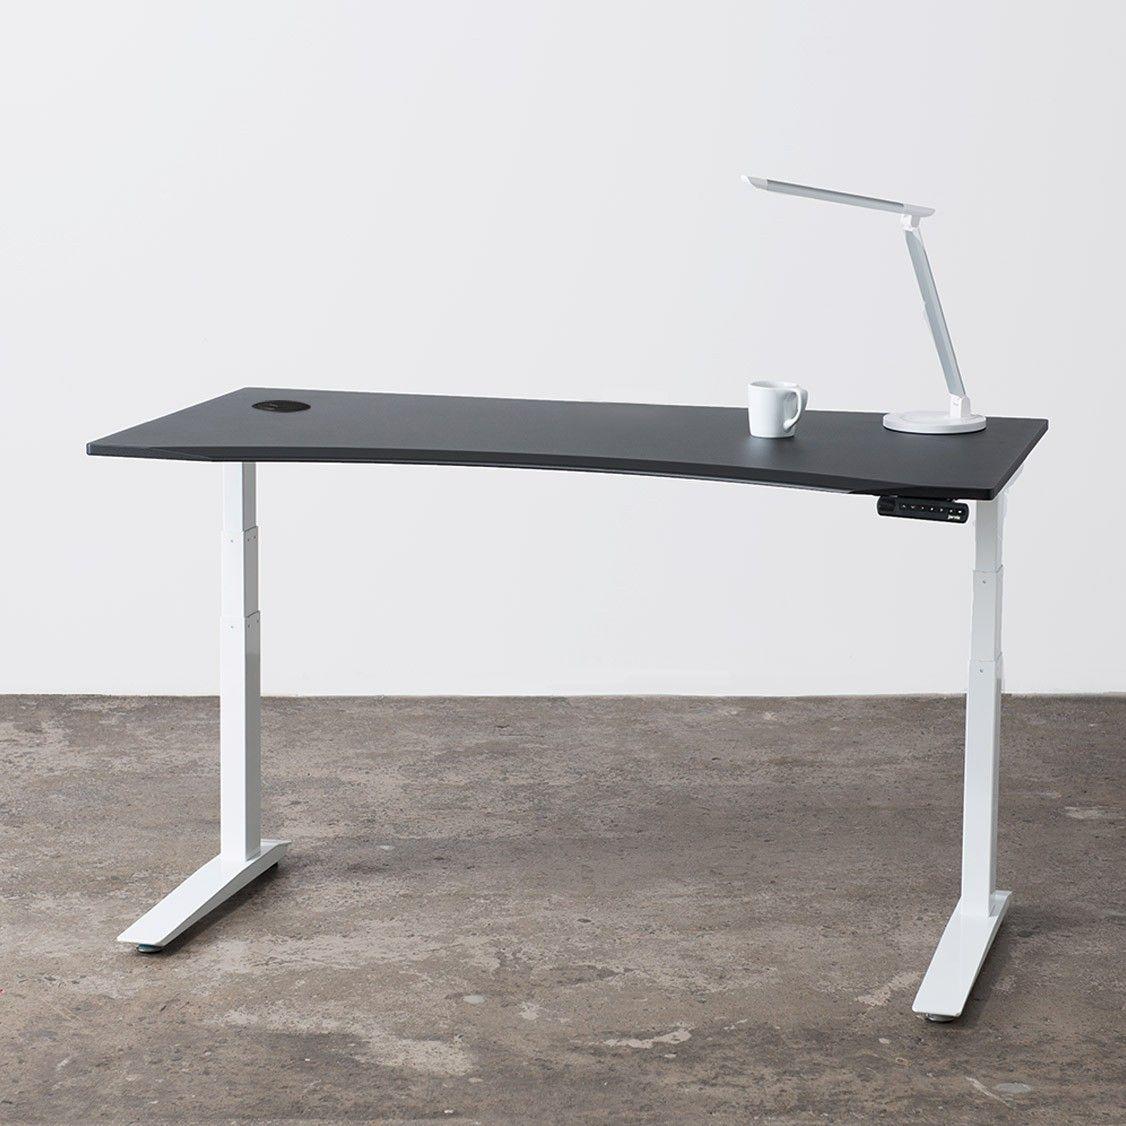 Favorite Jarvis Standing Desk Contour White Top Black Frame